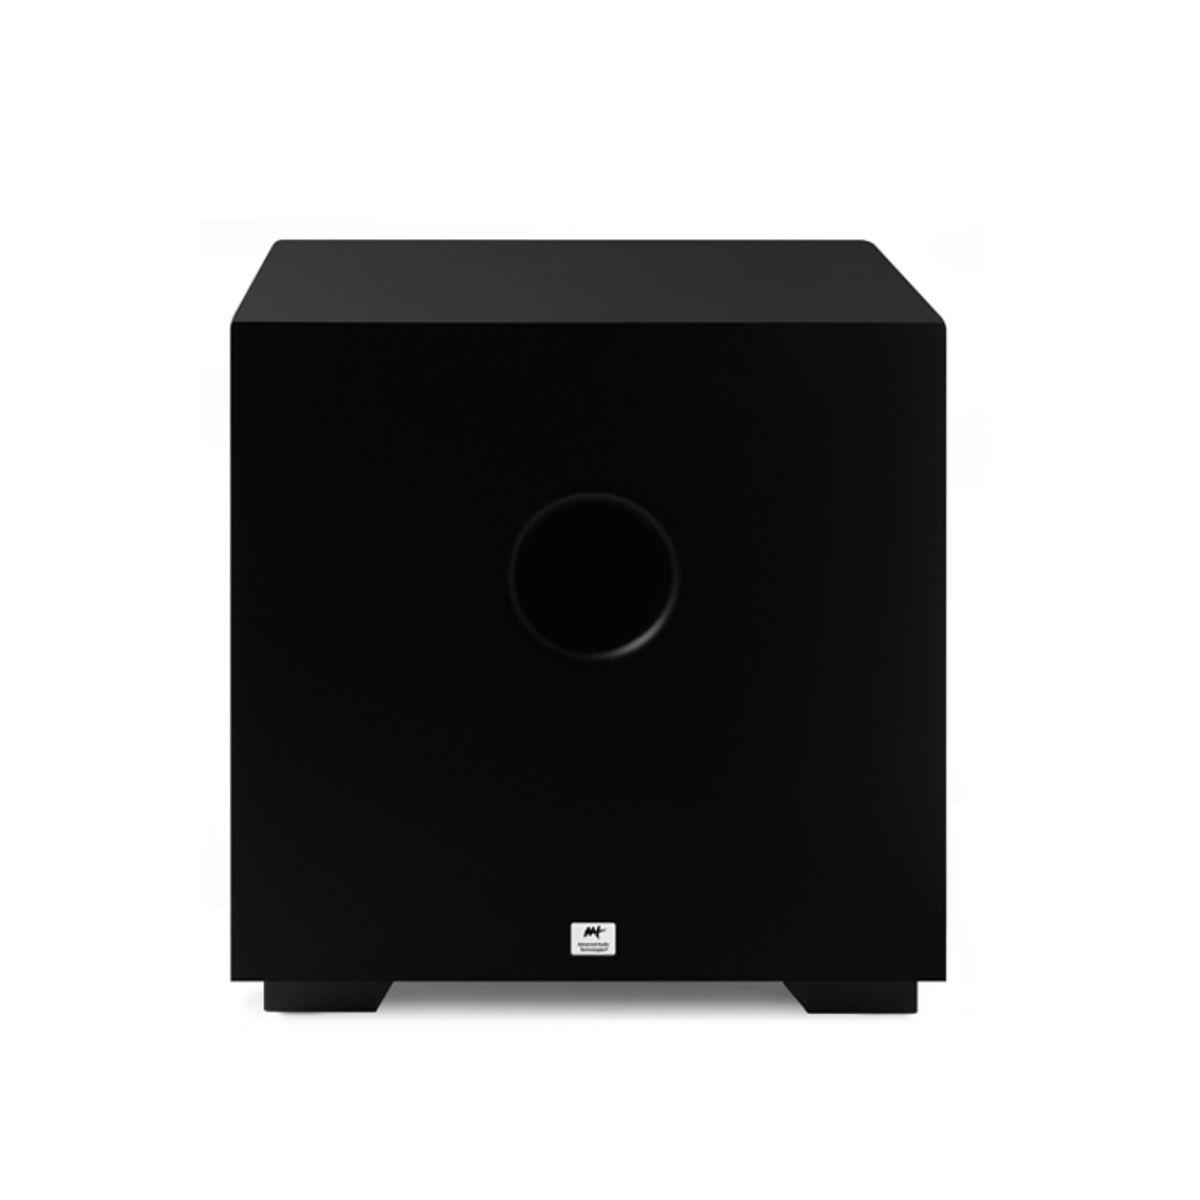 Kit 5.1.2 Dolby Atmos Caixa Acústica de Embutir LCR-A100 + LR-E100 + NQ6-M100 + Subwoofer Compact Cube 10 AAT